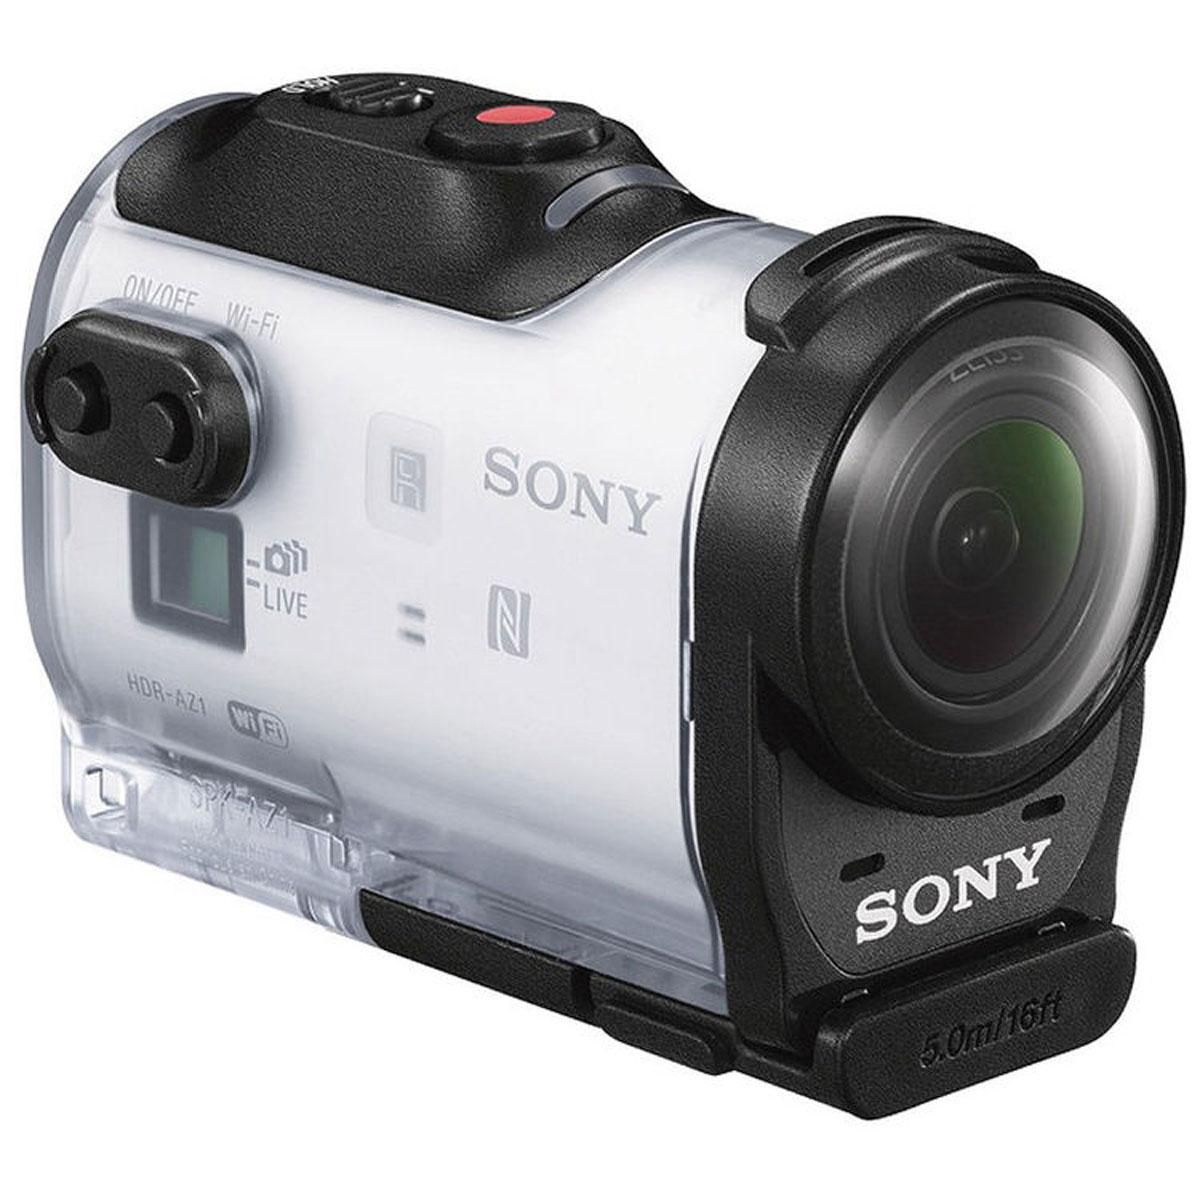 Sony HDR-AZ1VR экшн-камера + пульт ДУ Live-View sony hdr az1vr